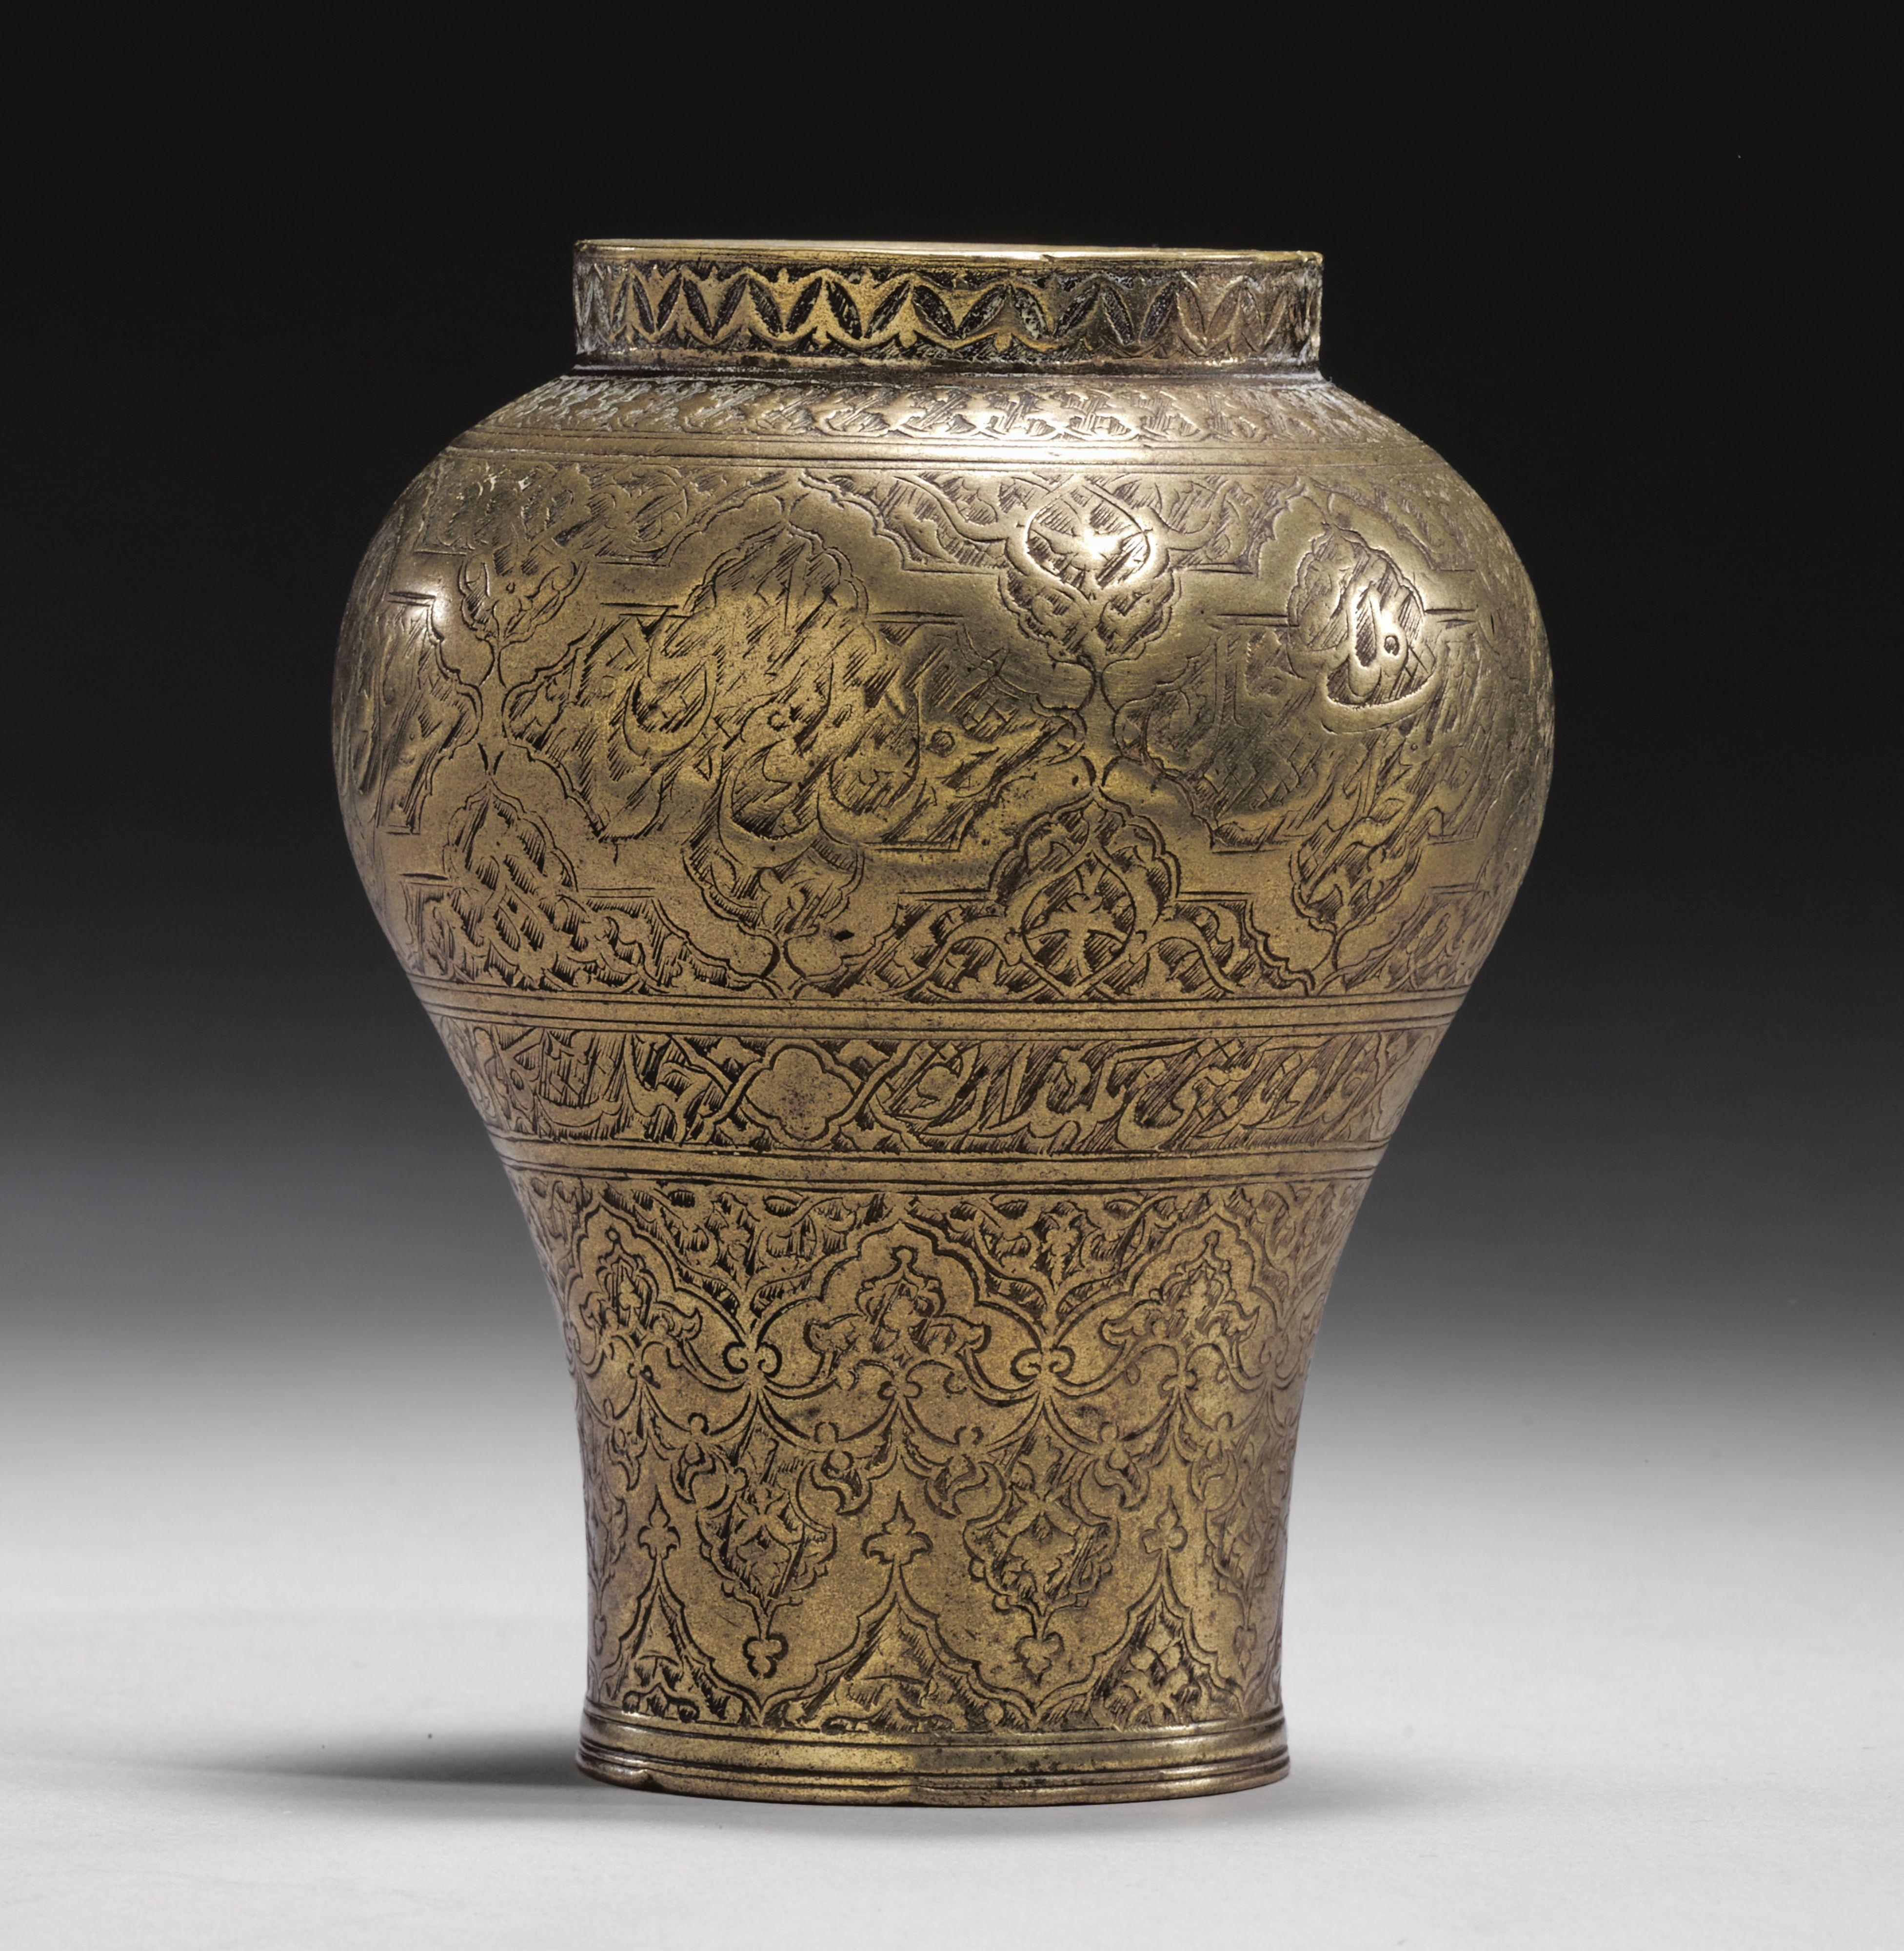 A small safavid brass jar persia 16th century a small safavid brass jar persia centuryp reviewsmspy